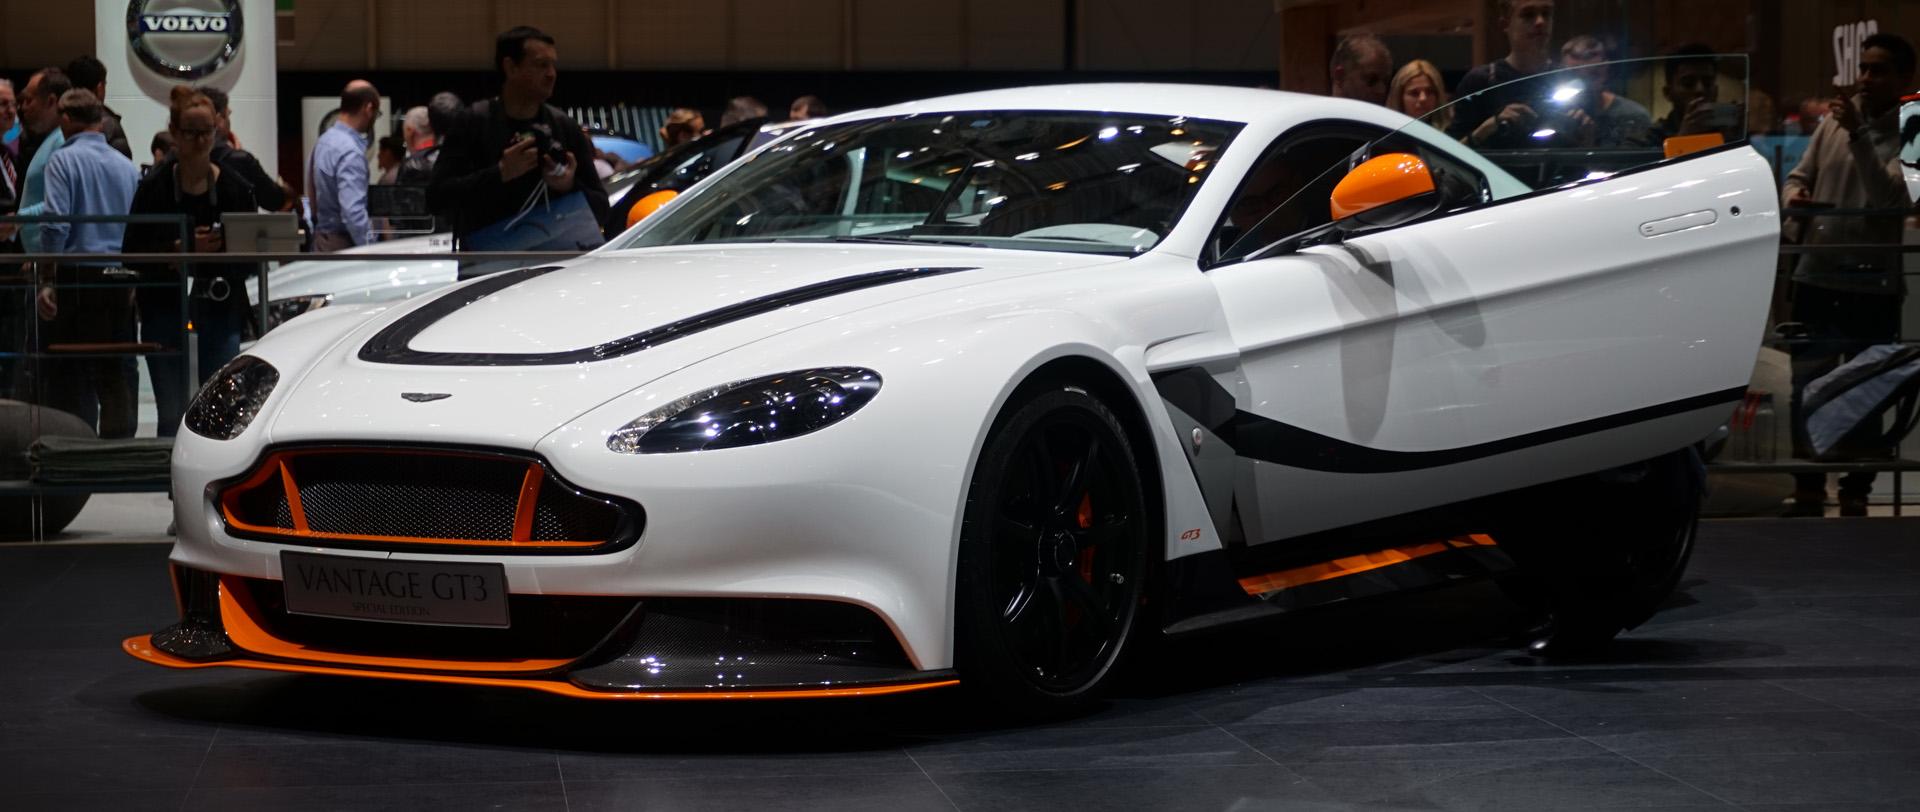 Aston-Martin-Vantage-GT3-GT12